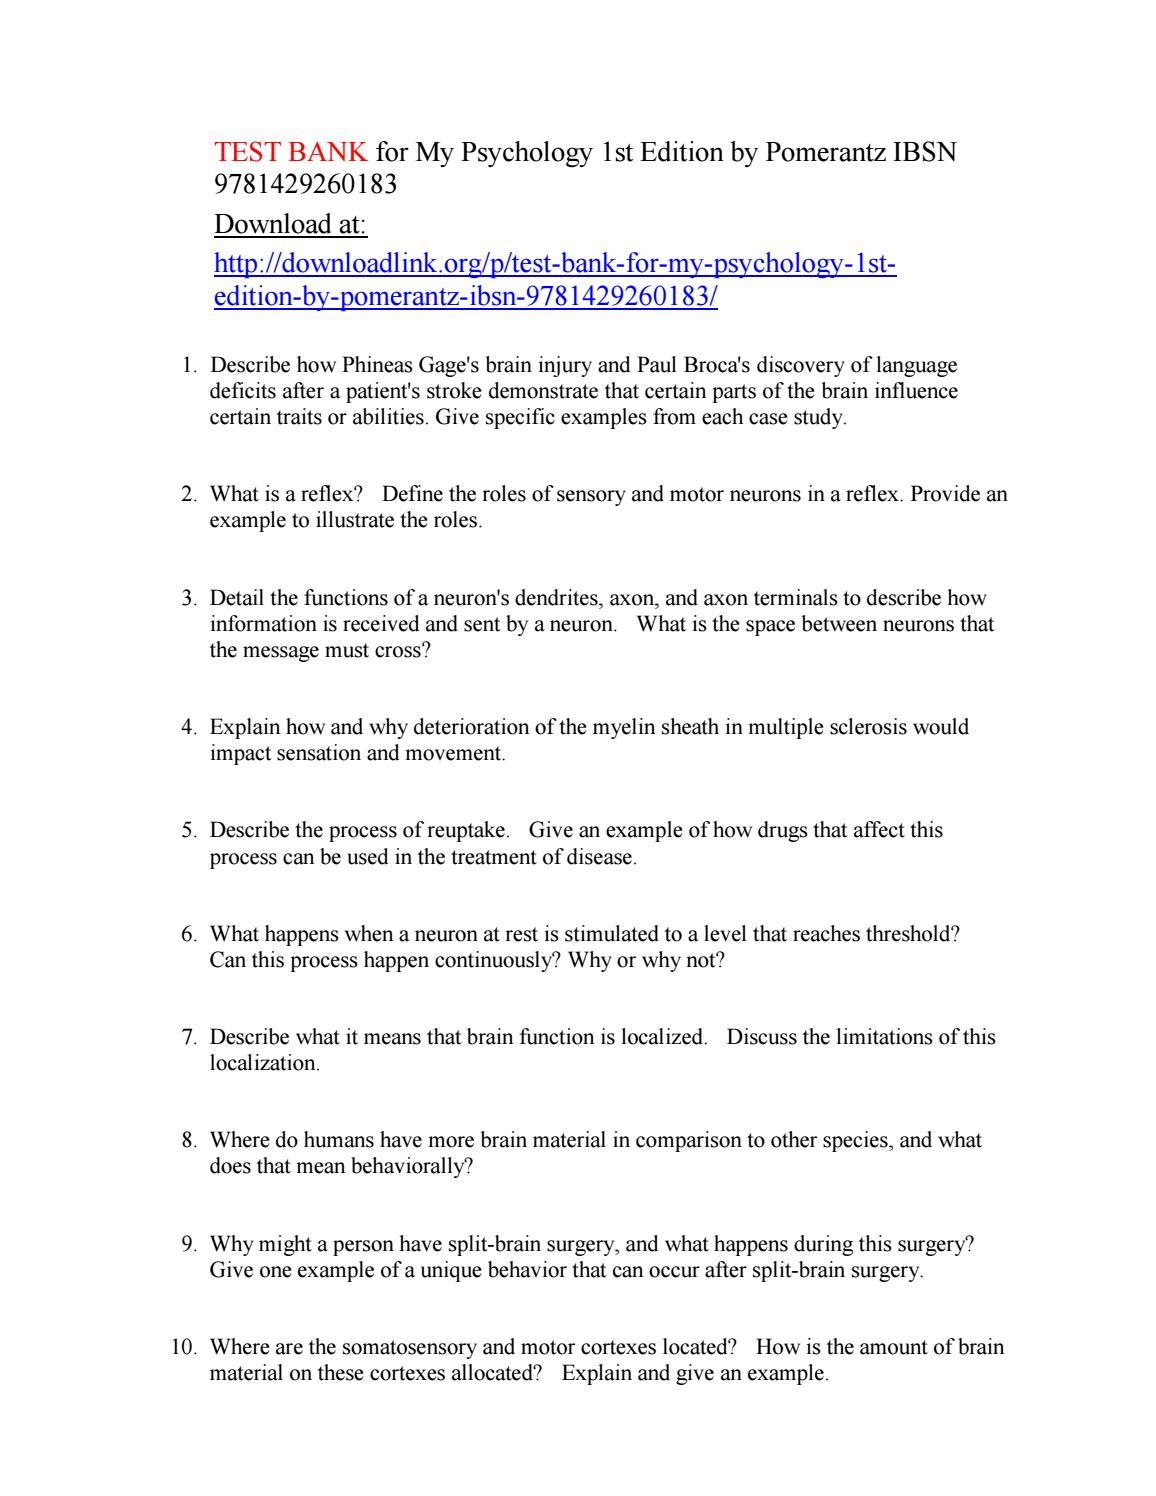 Test Bank for My Psychology 1st Edition by Pomerantz IBSN